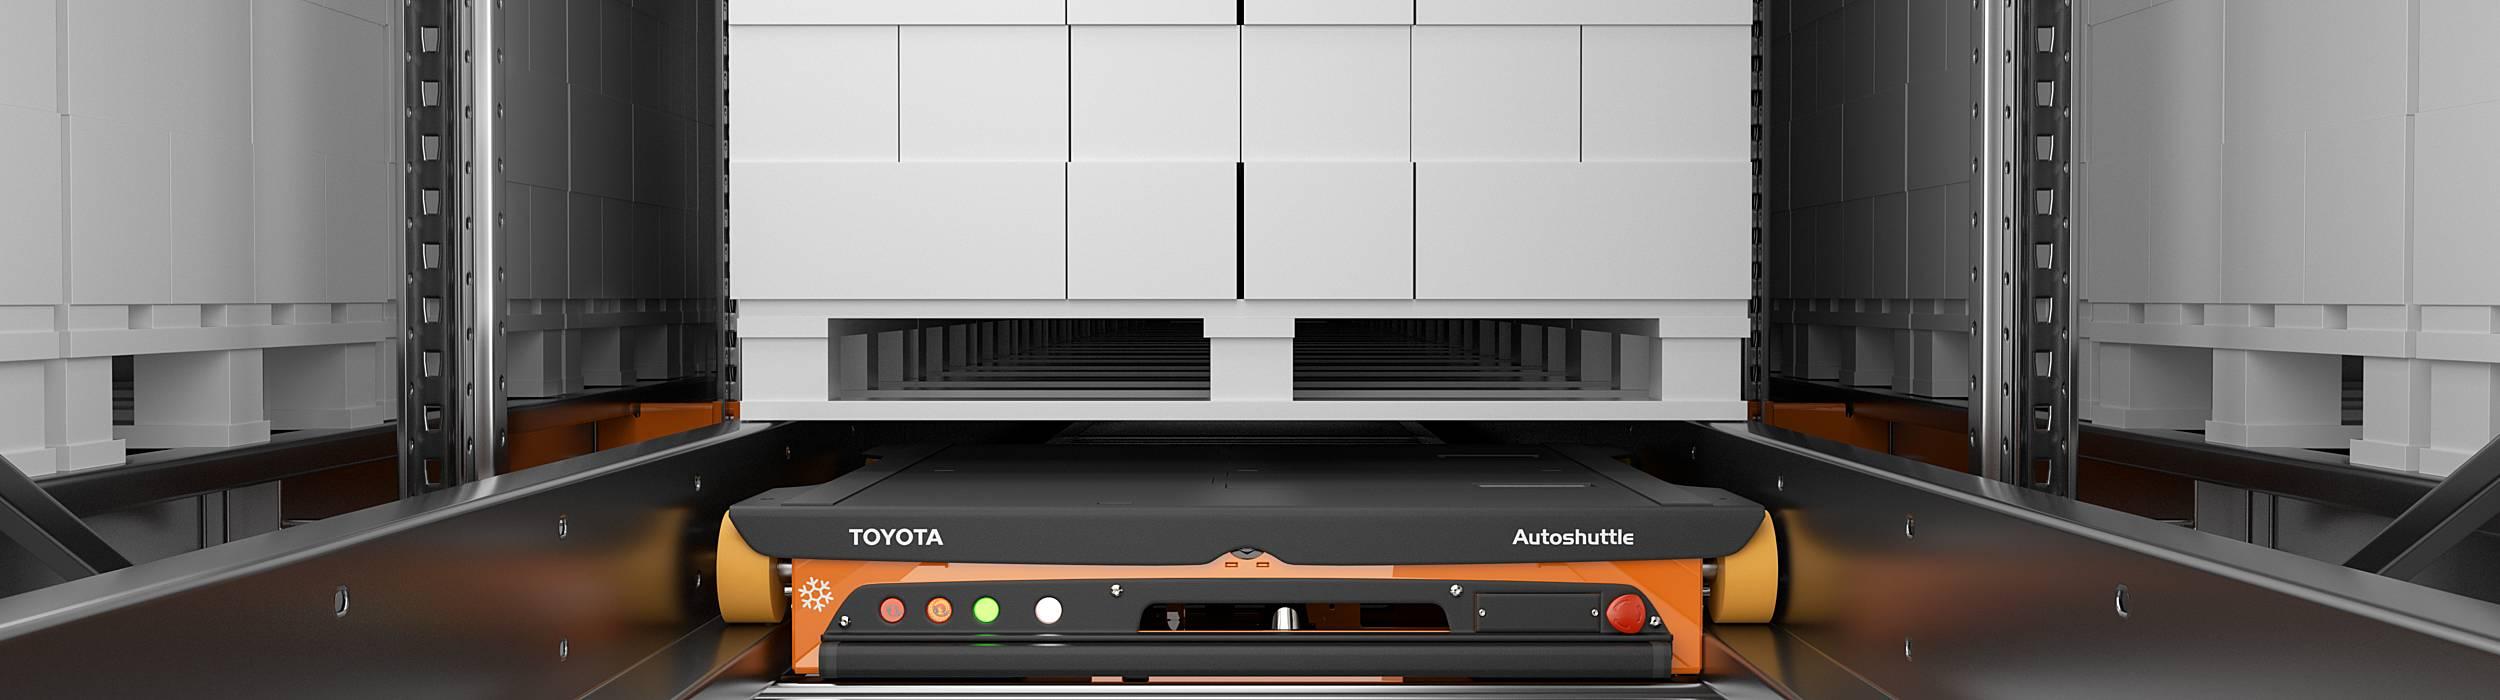 Toyota automatiserede radioshuttles